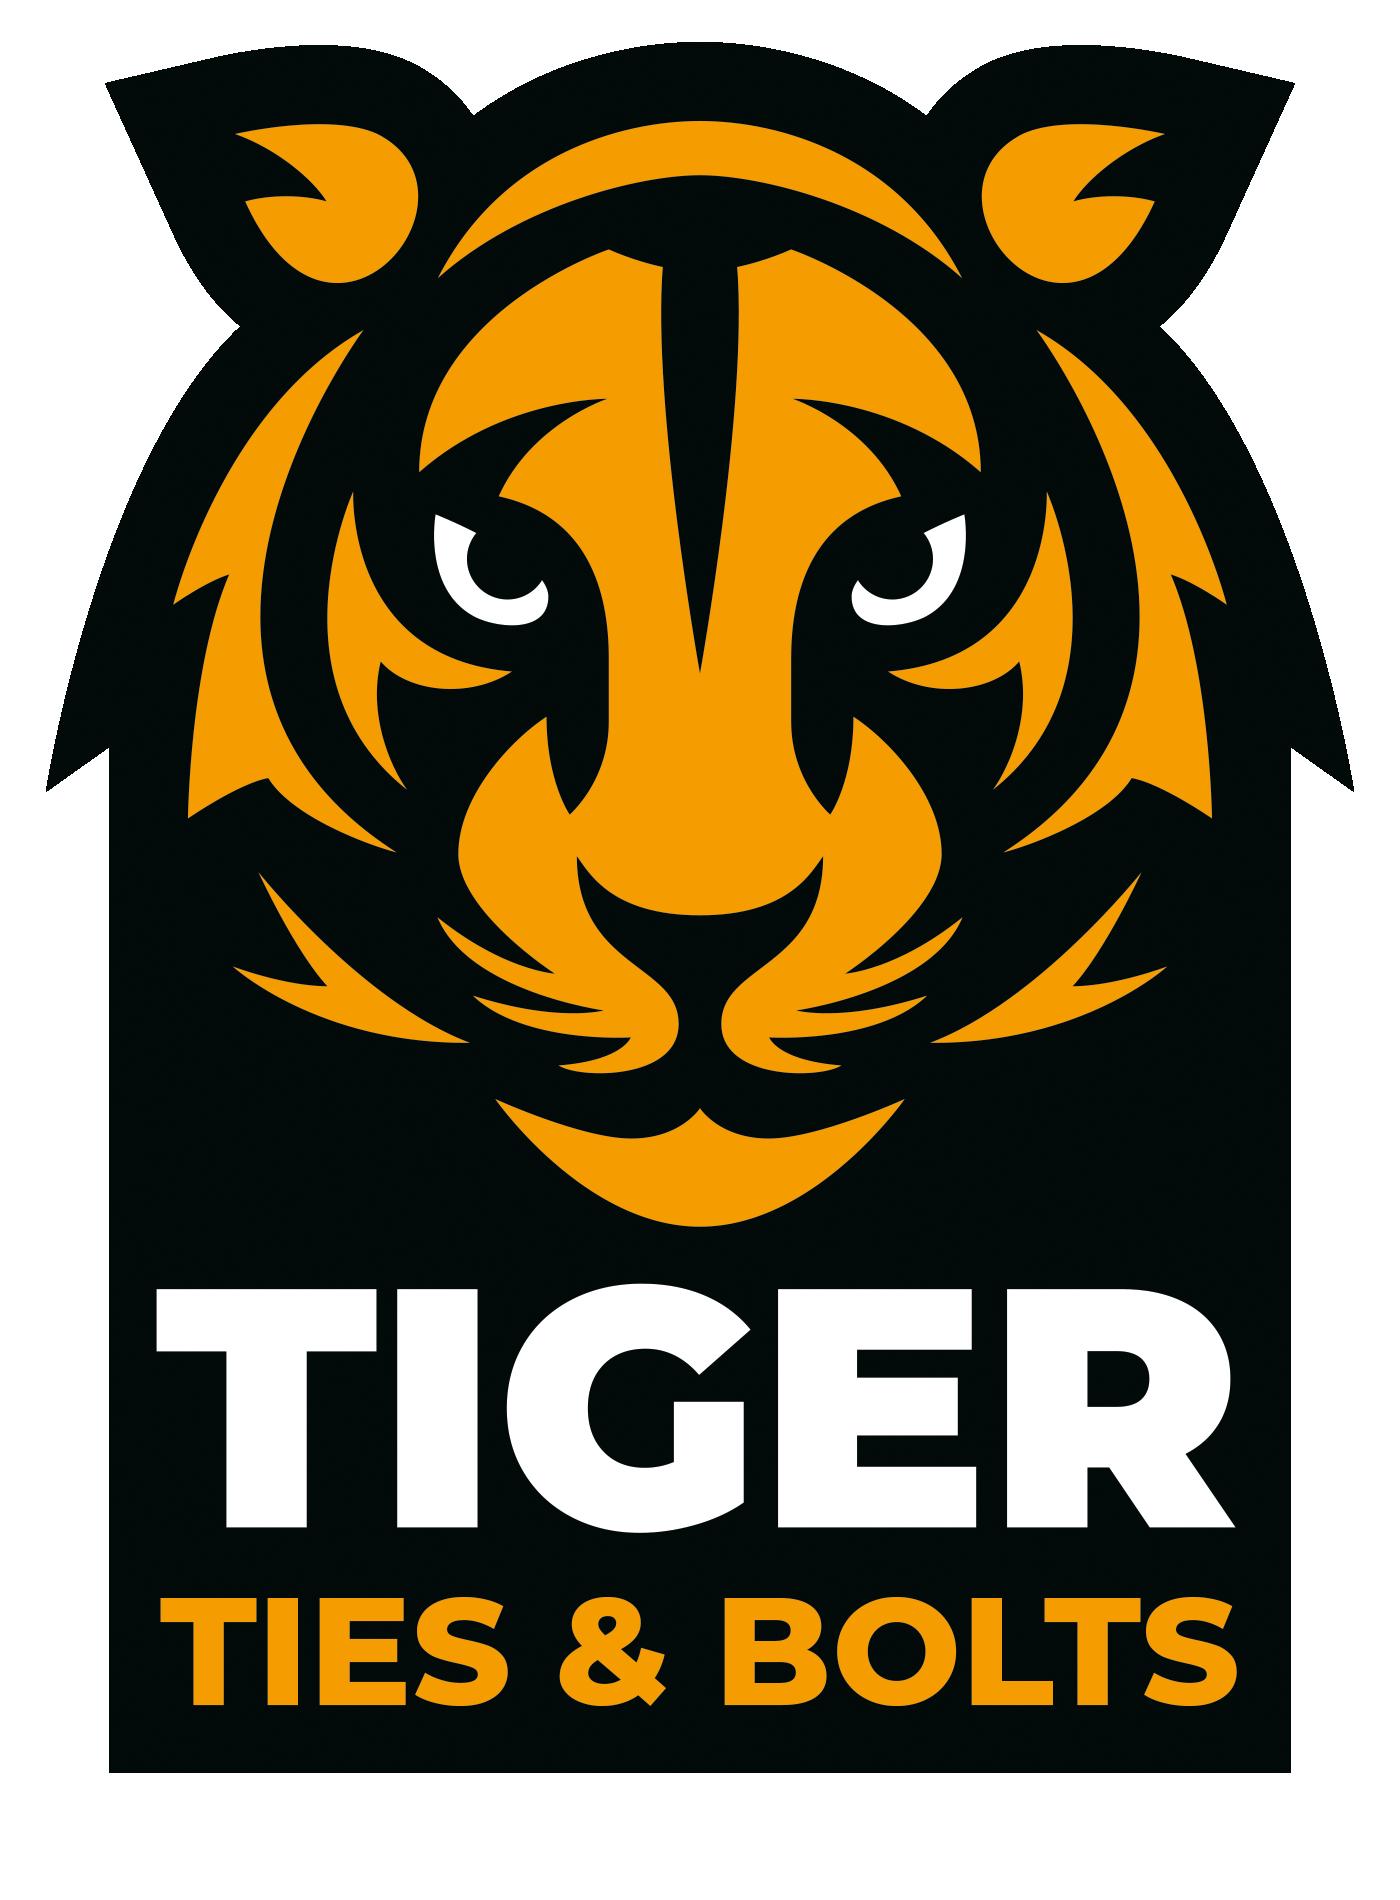 TIGER Ties and Bolts